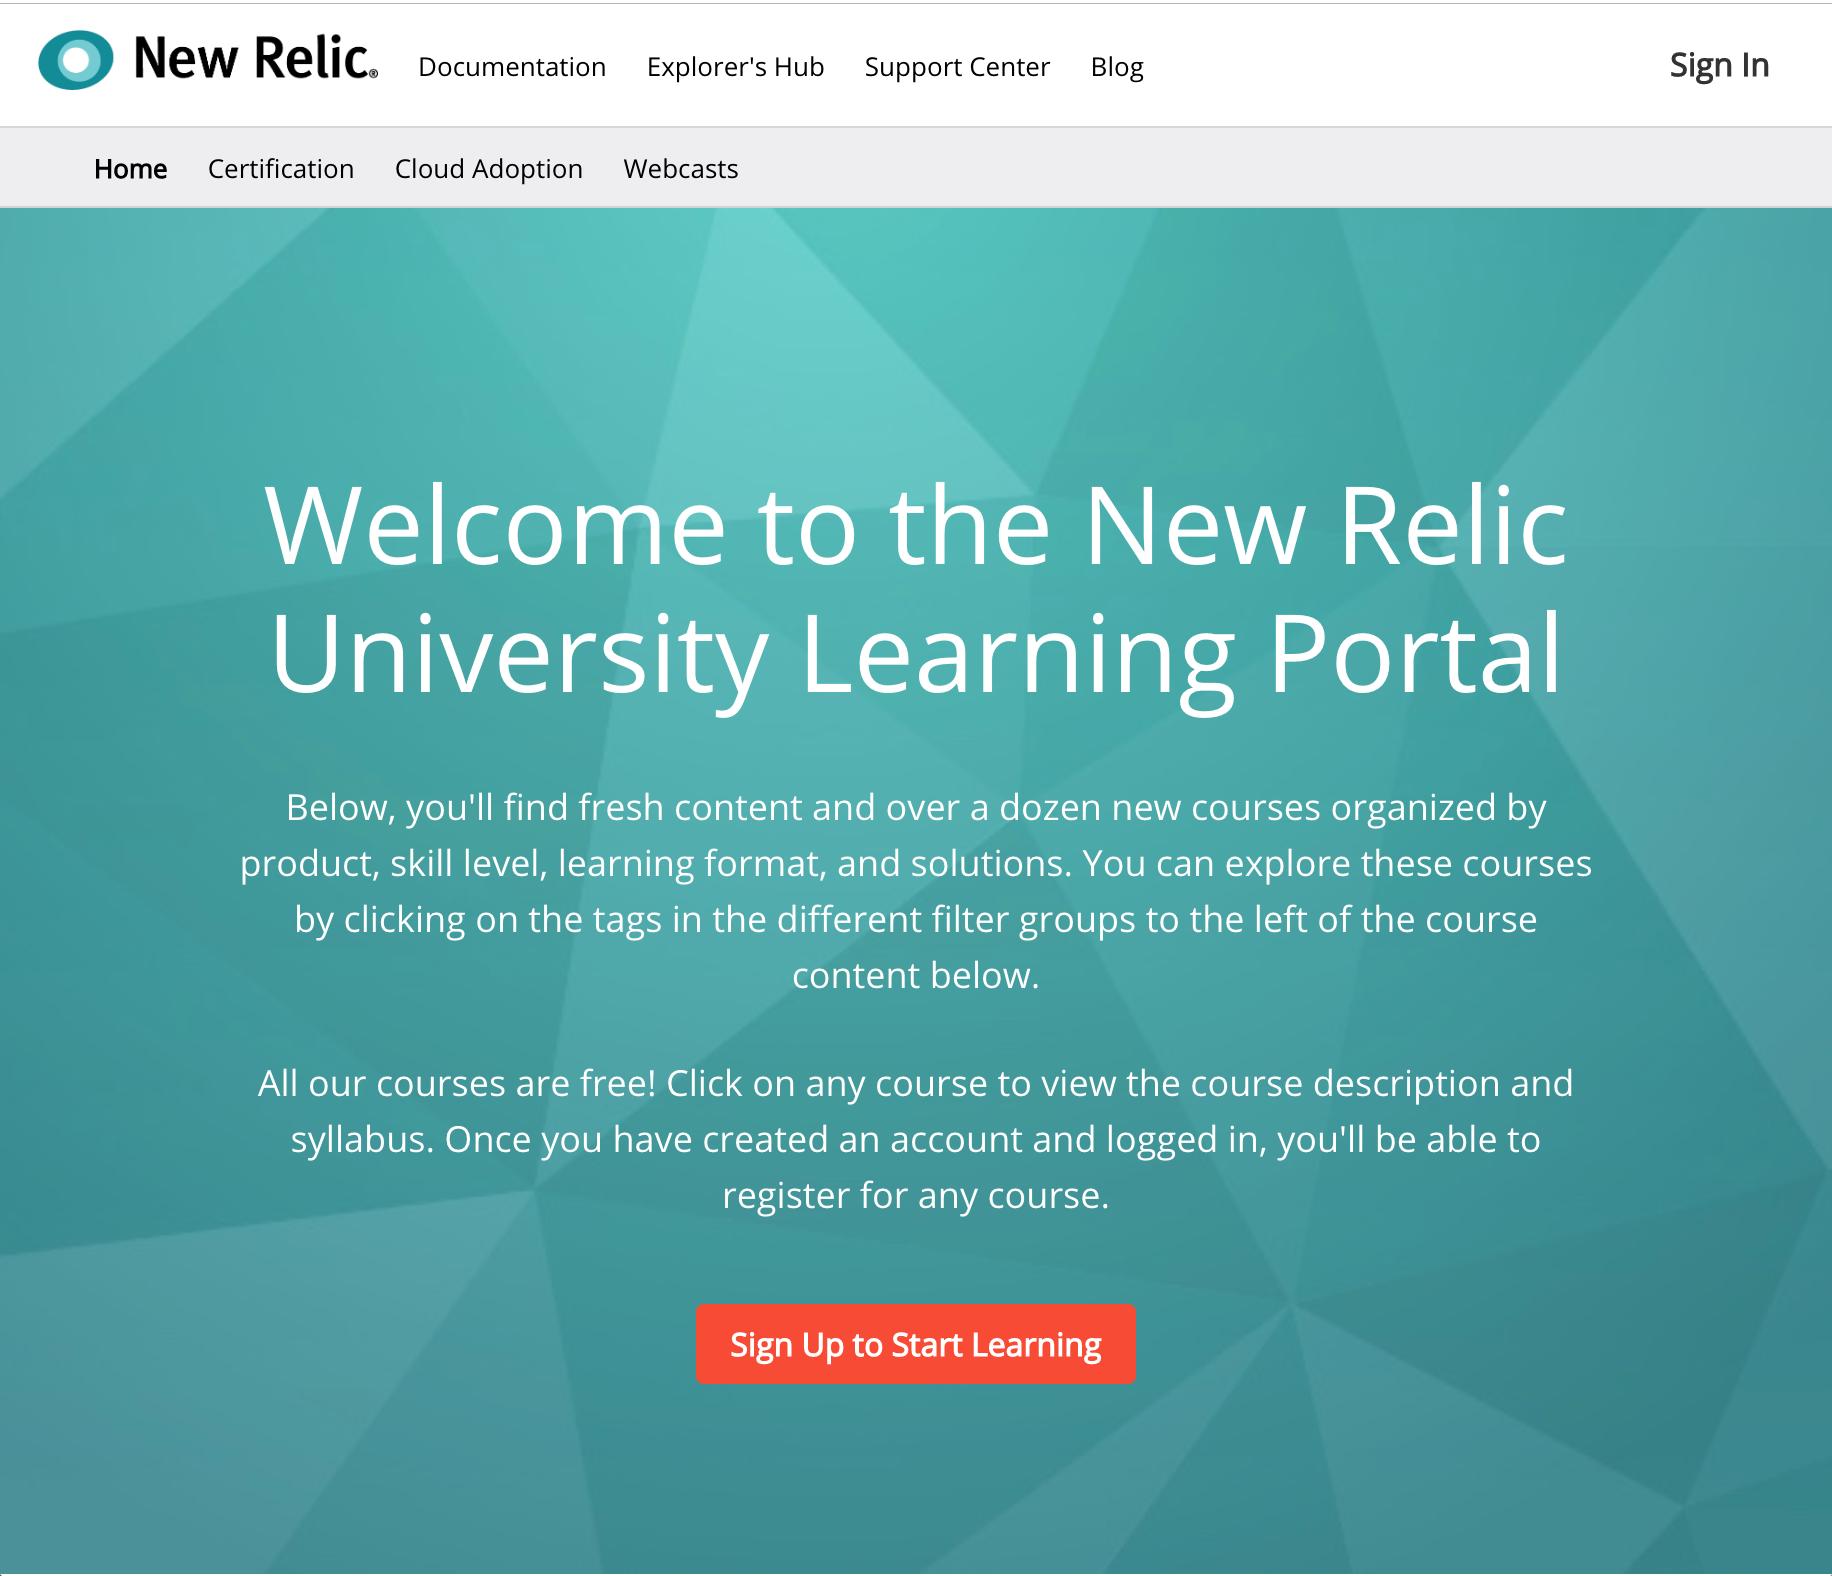 New Relic University LMS Training